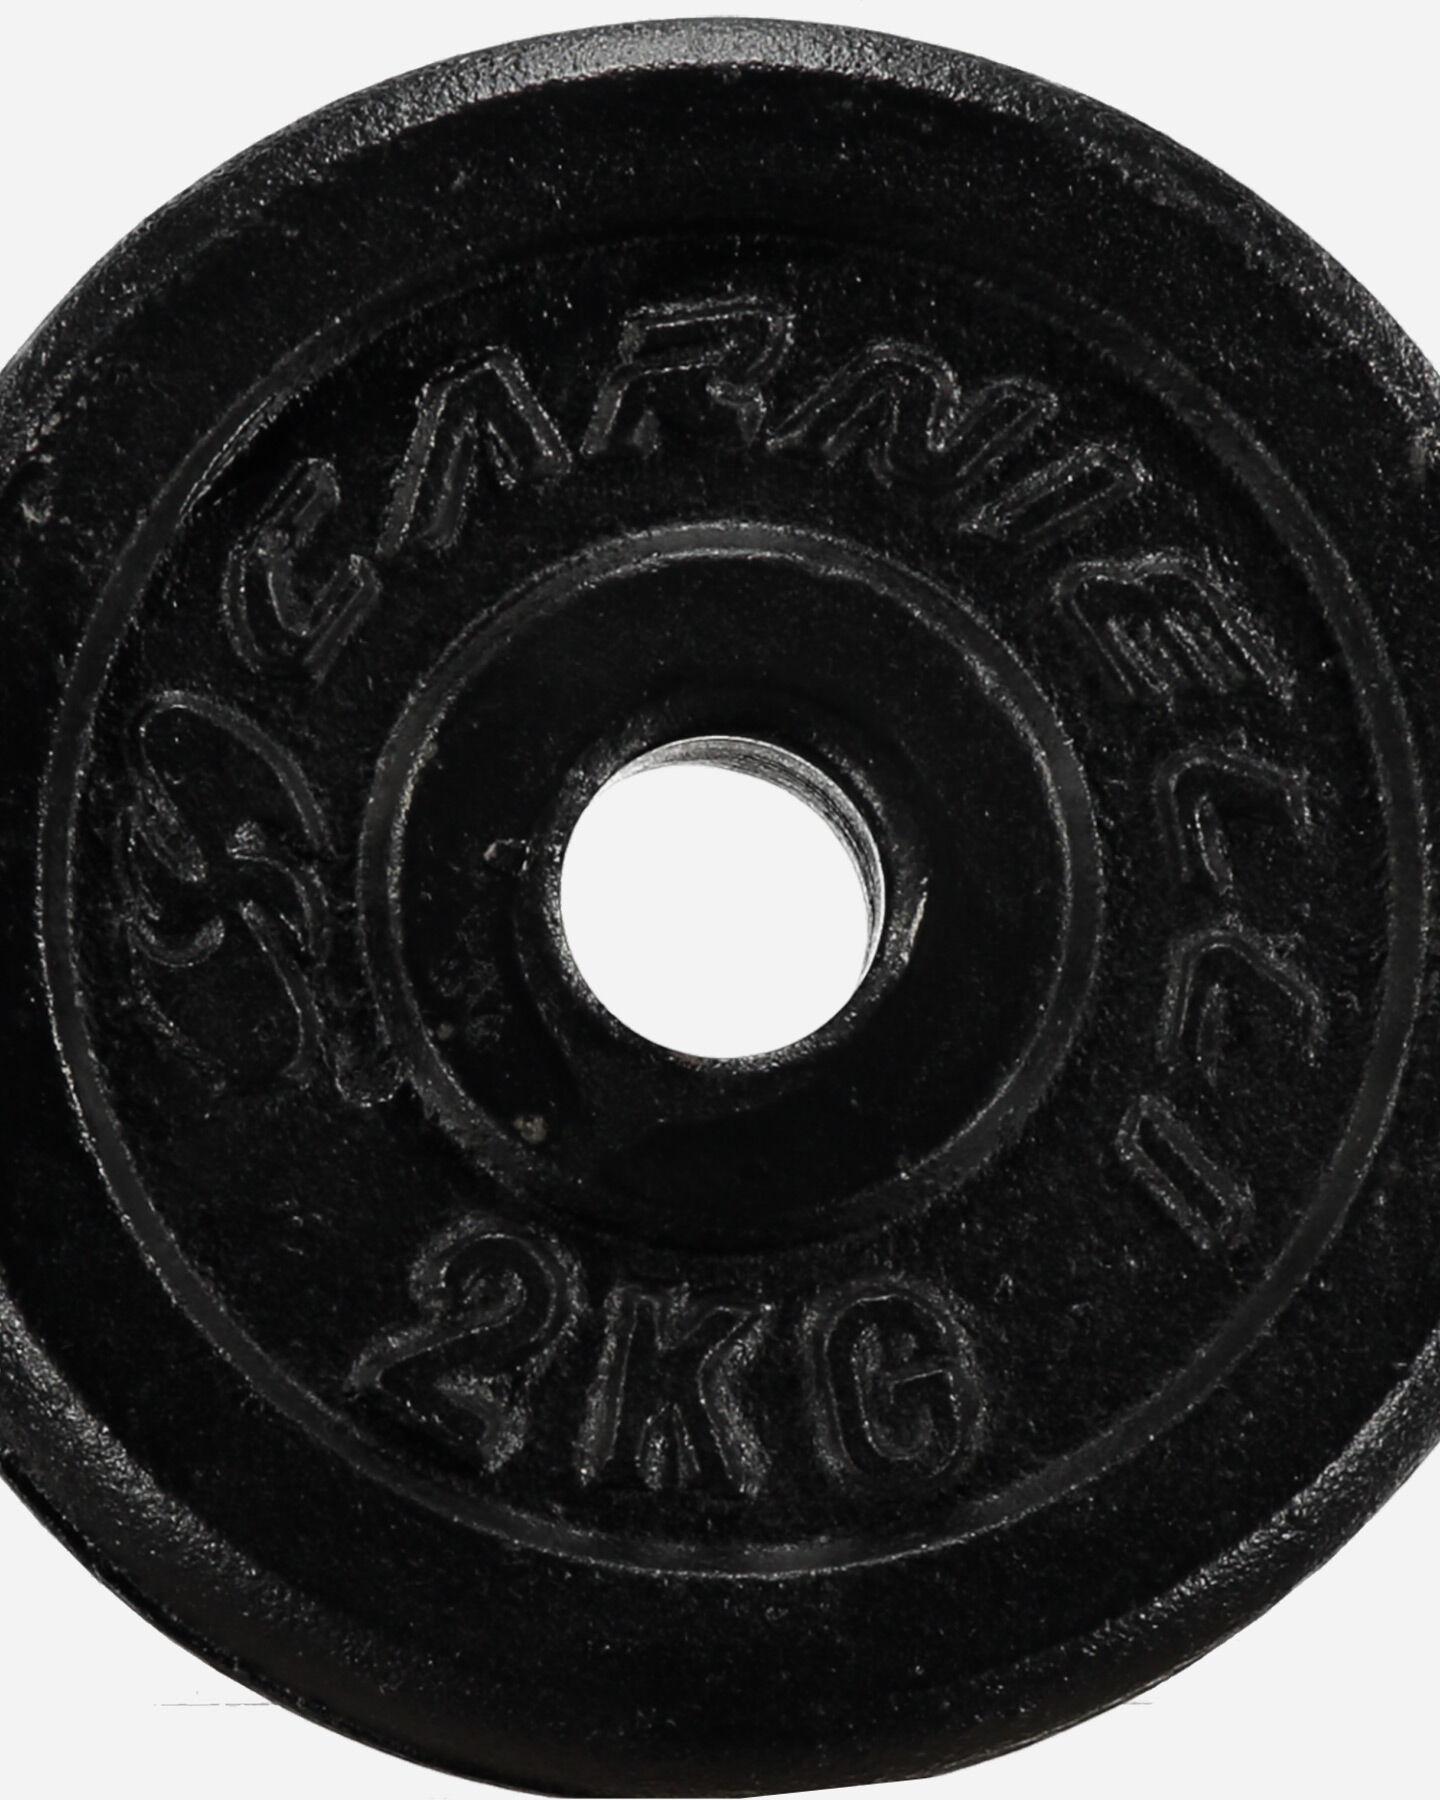 Disco ghisa CARNIELLI DISCO 2 KG S0265716|9999|UNI scatto 1